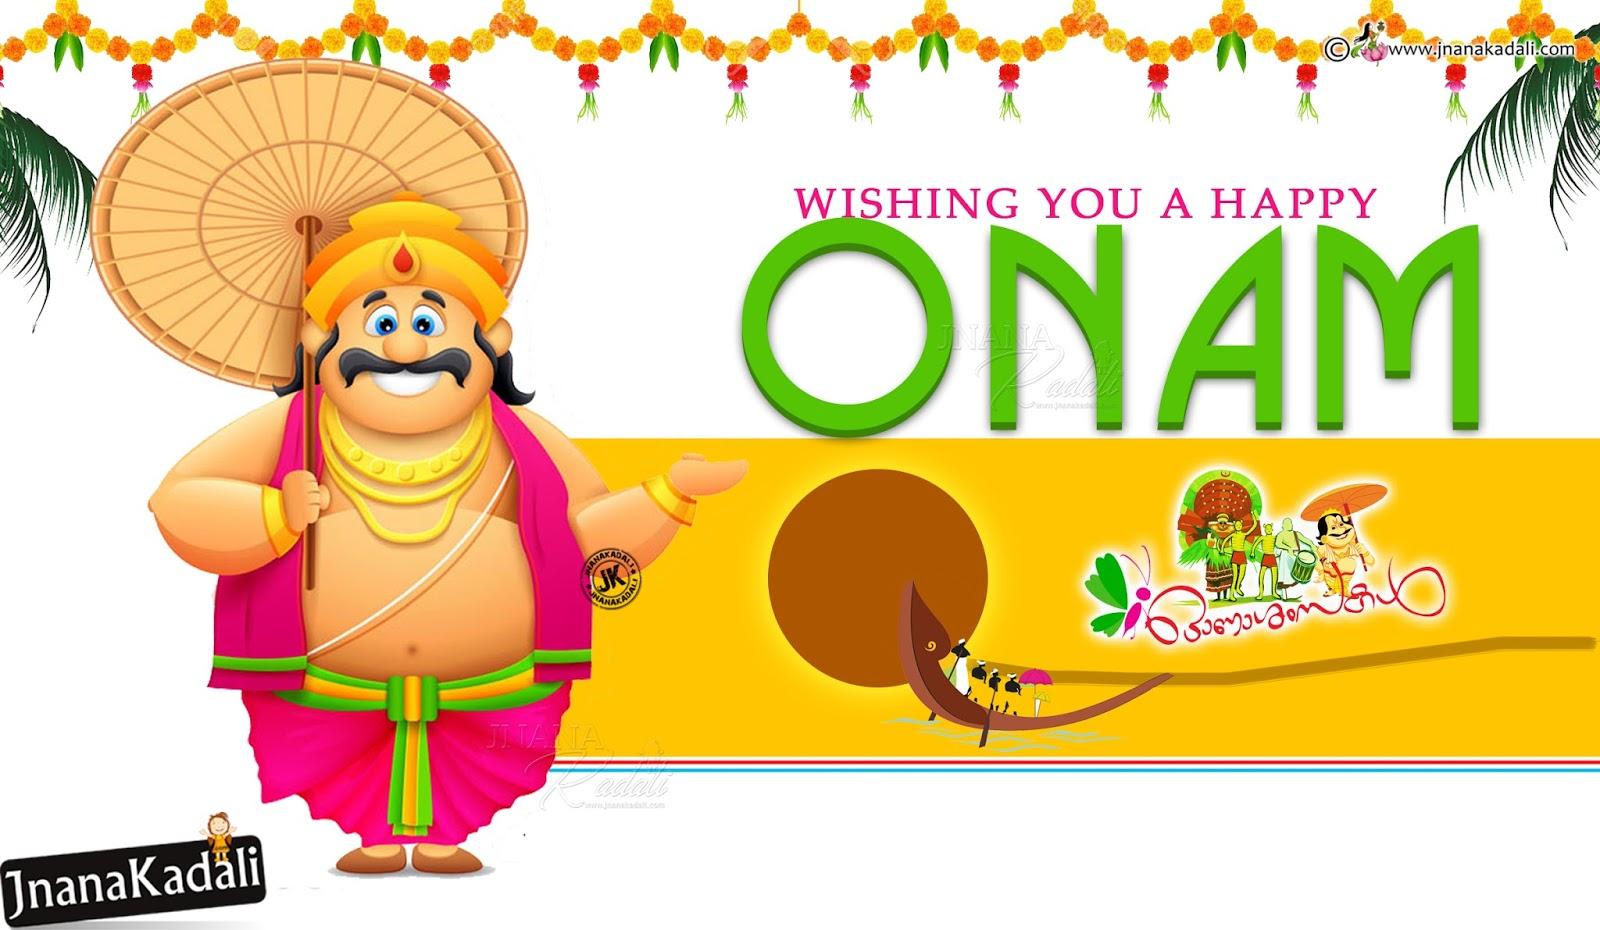 2017 Advanced Trending Onam Greetings With Mahabali Hd Wallpapers